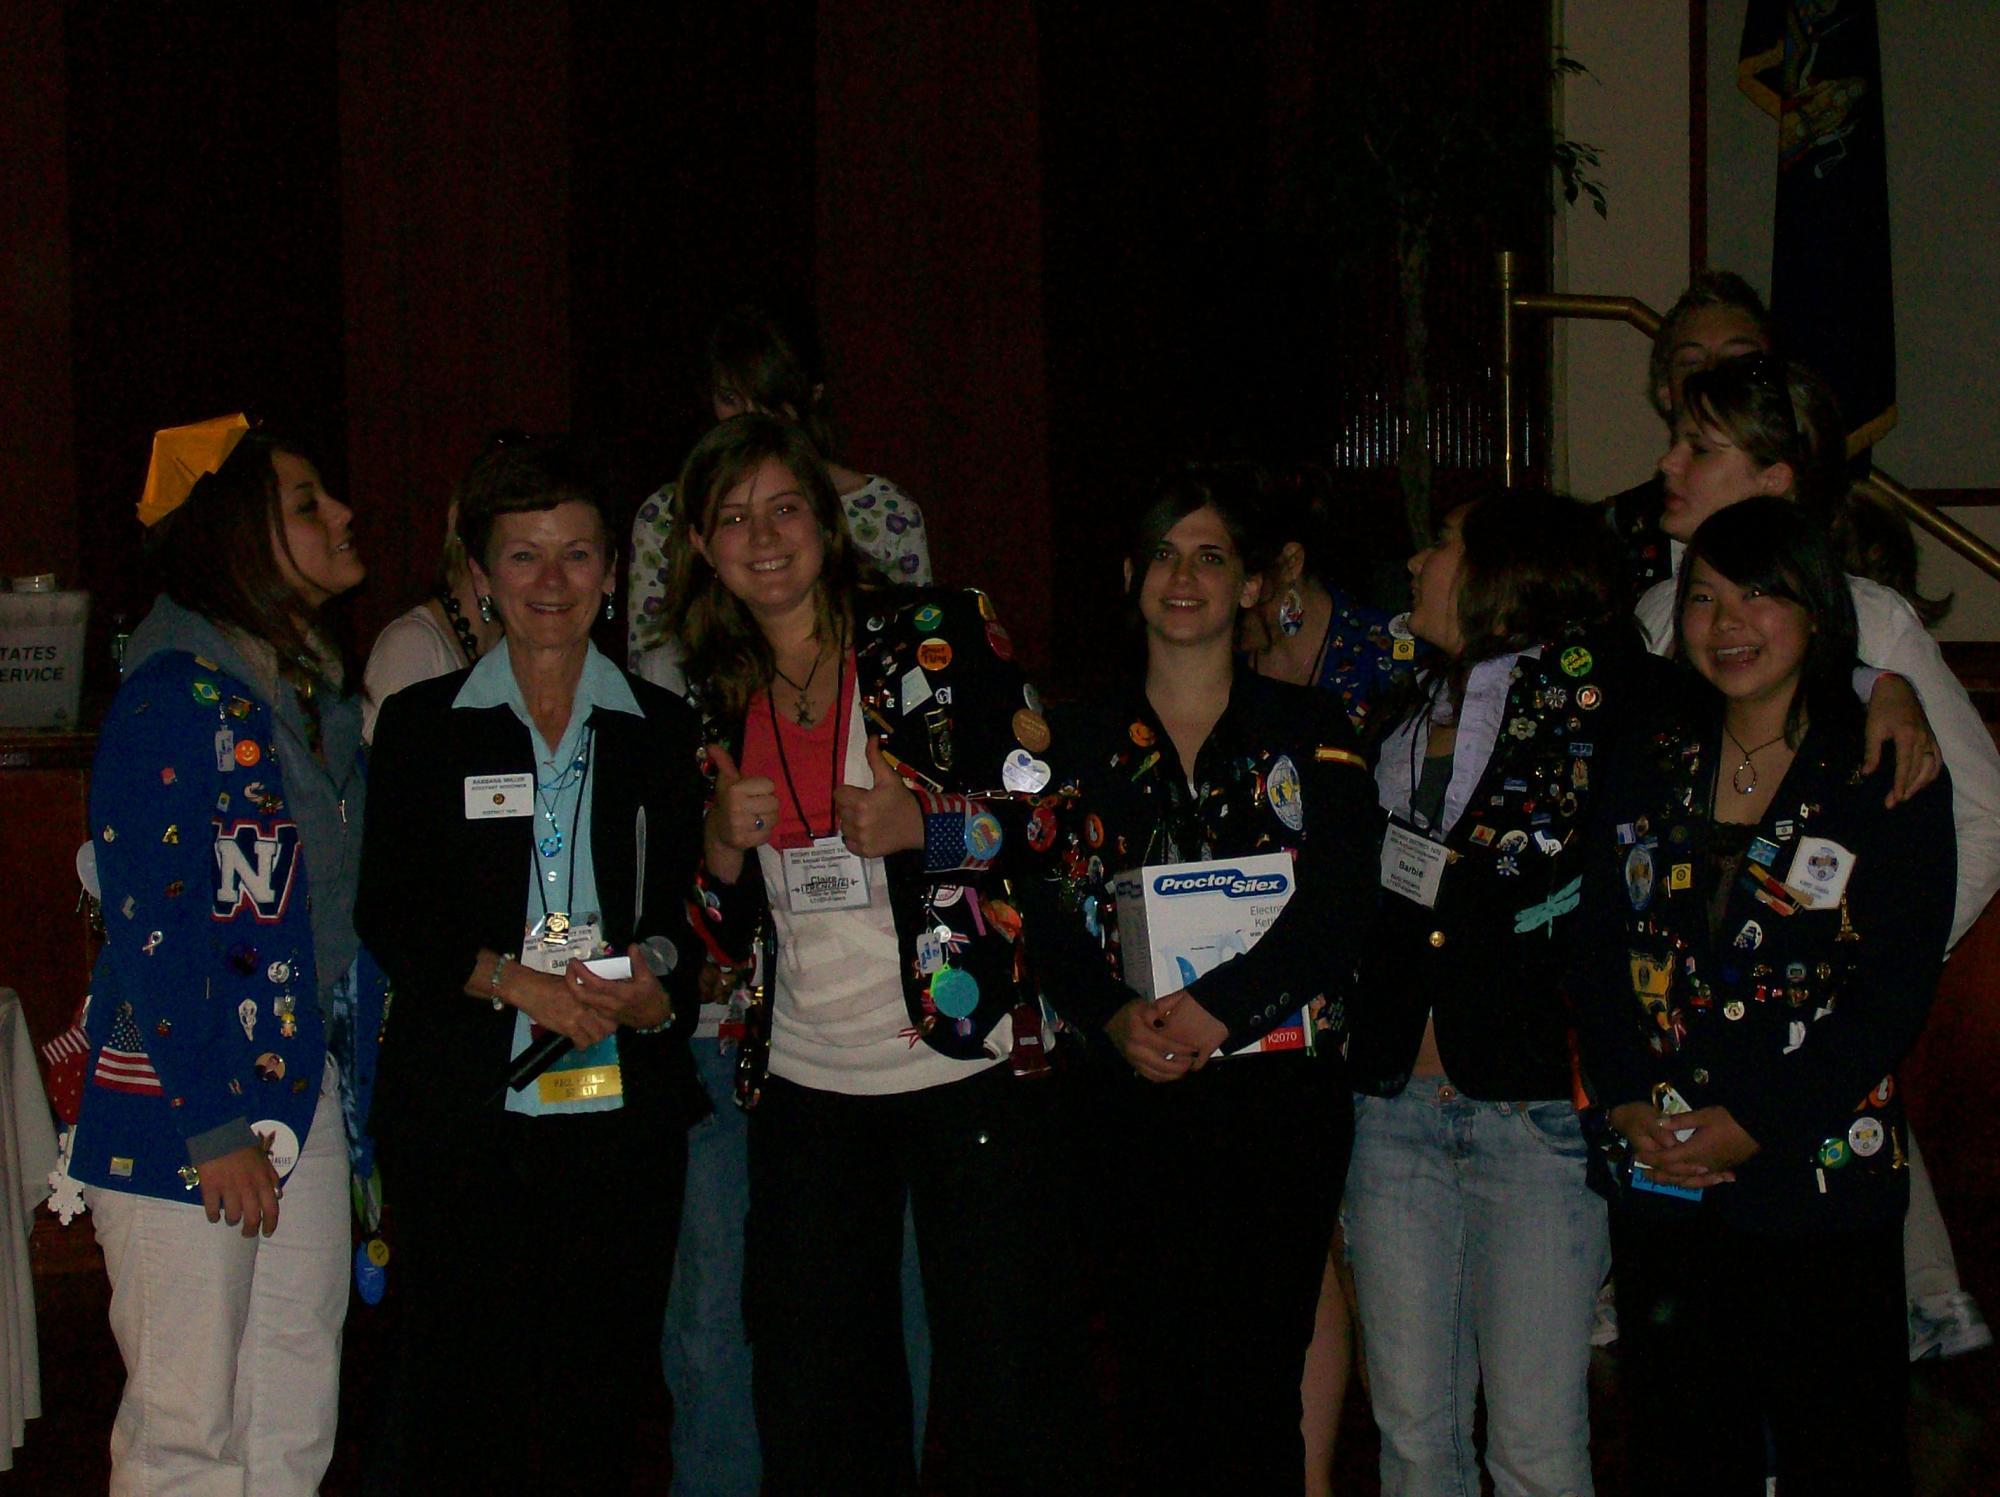 2007_5th_Anniversary_Celebration___4_.JPG